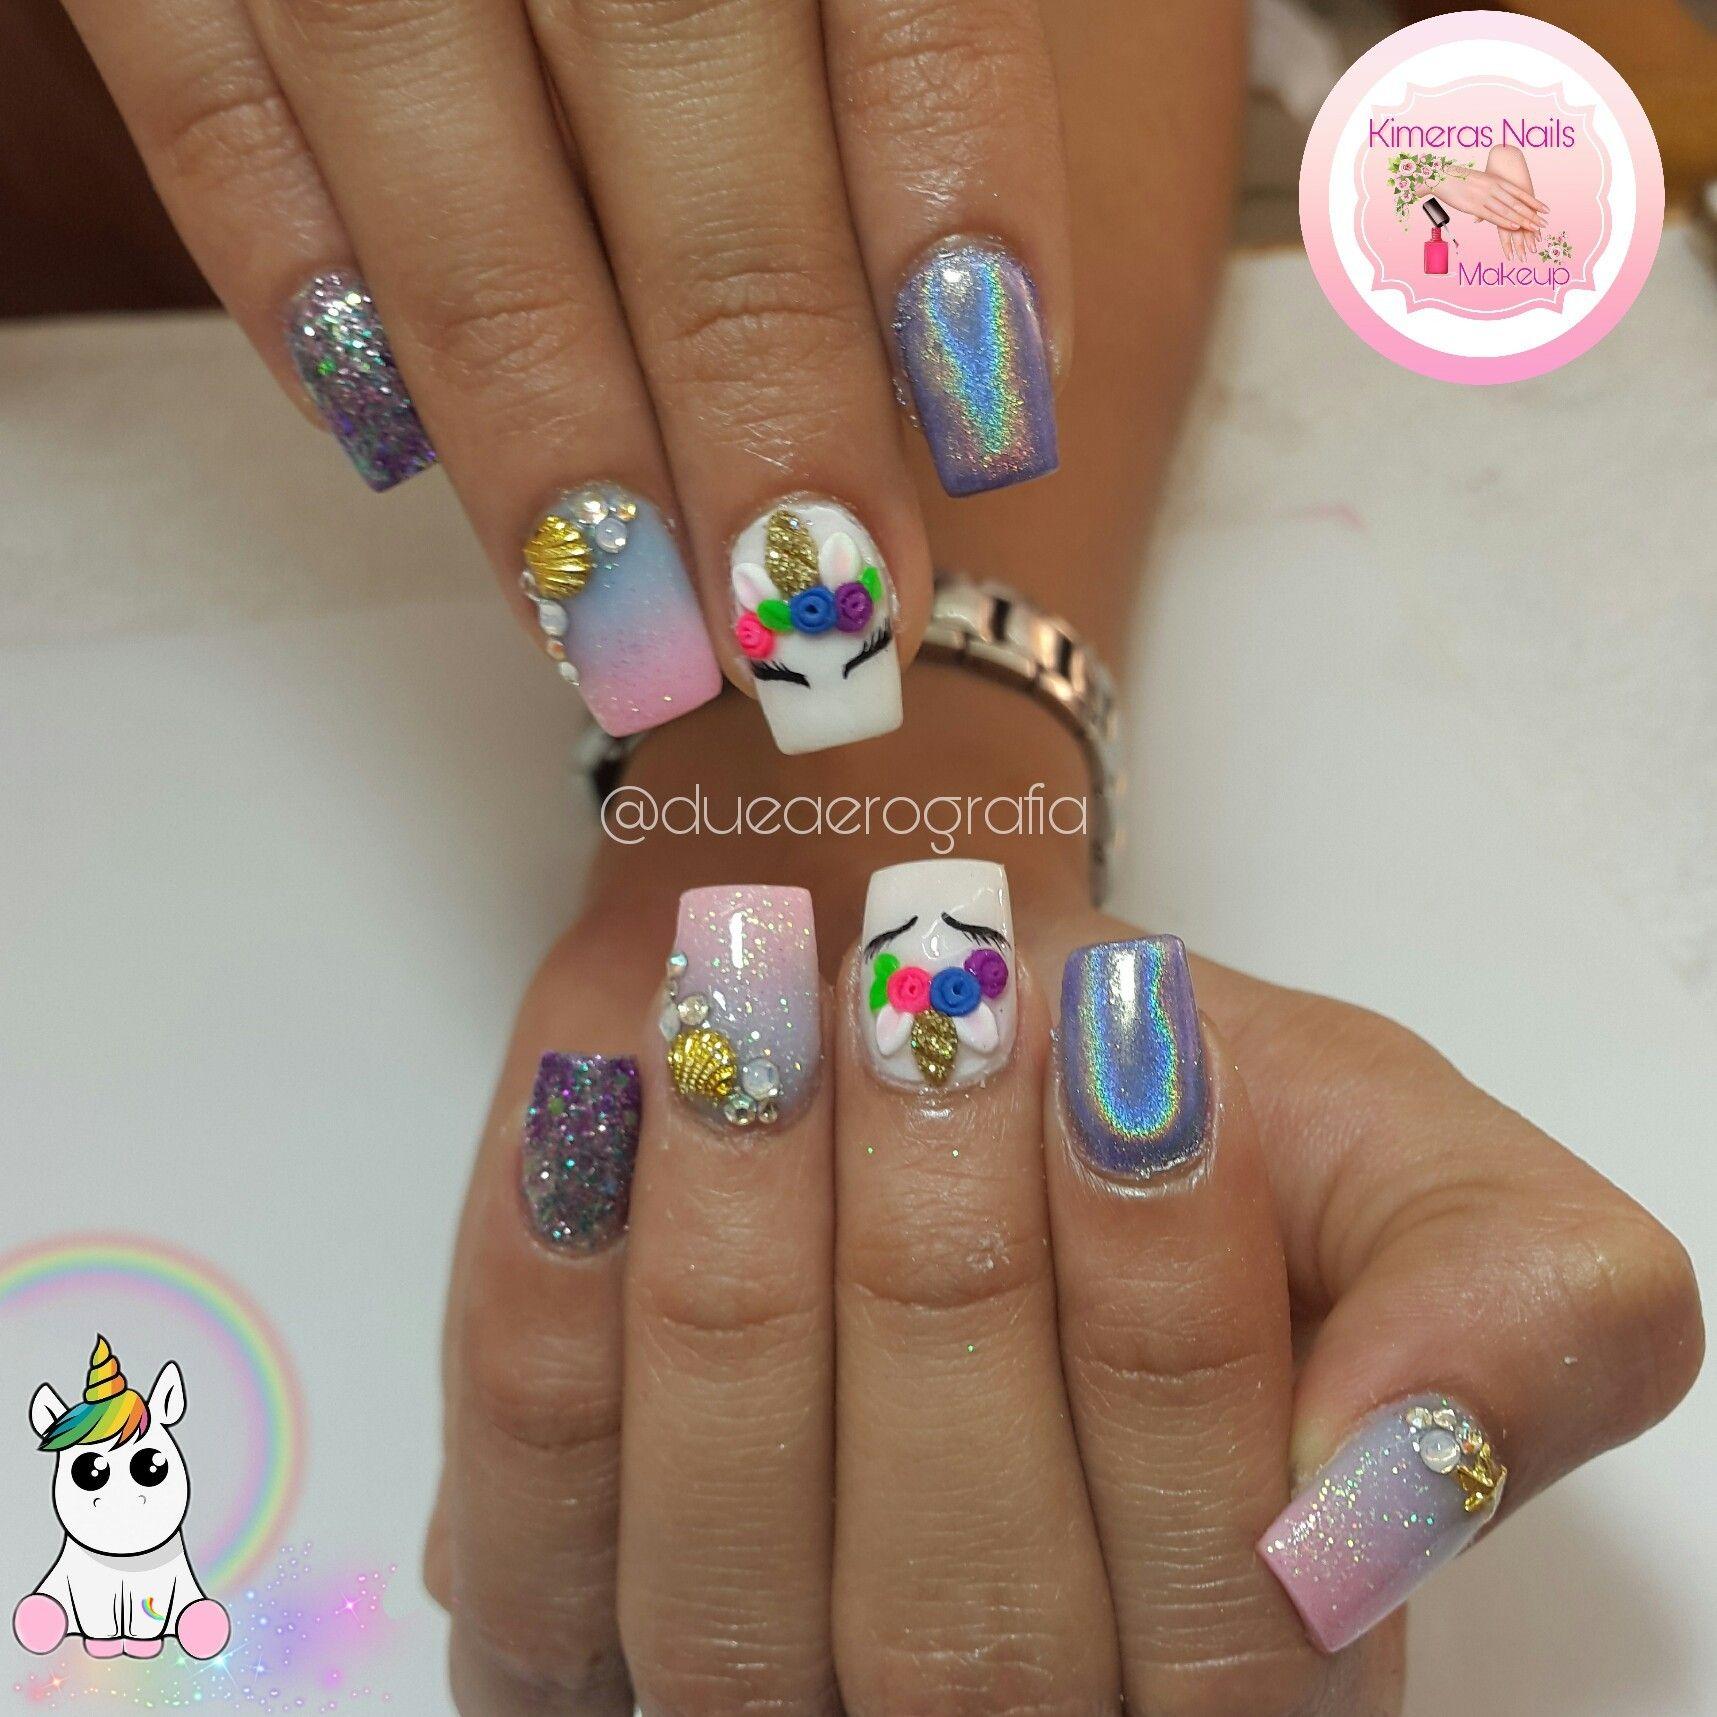 Diseño de salón #kimerasnails #dueaerografia #nails #uñas ...